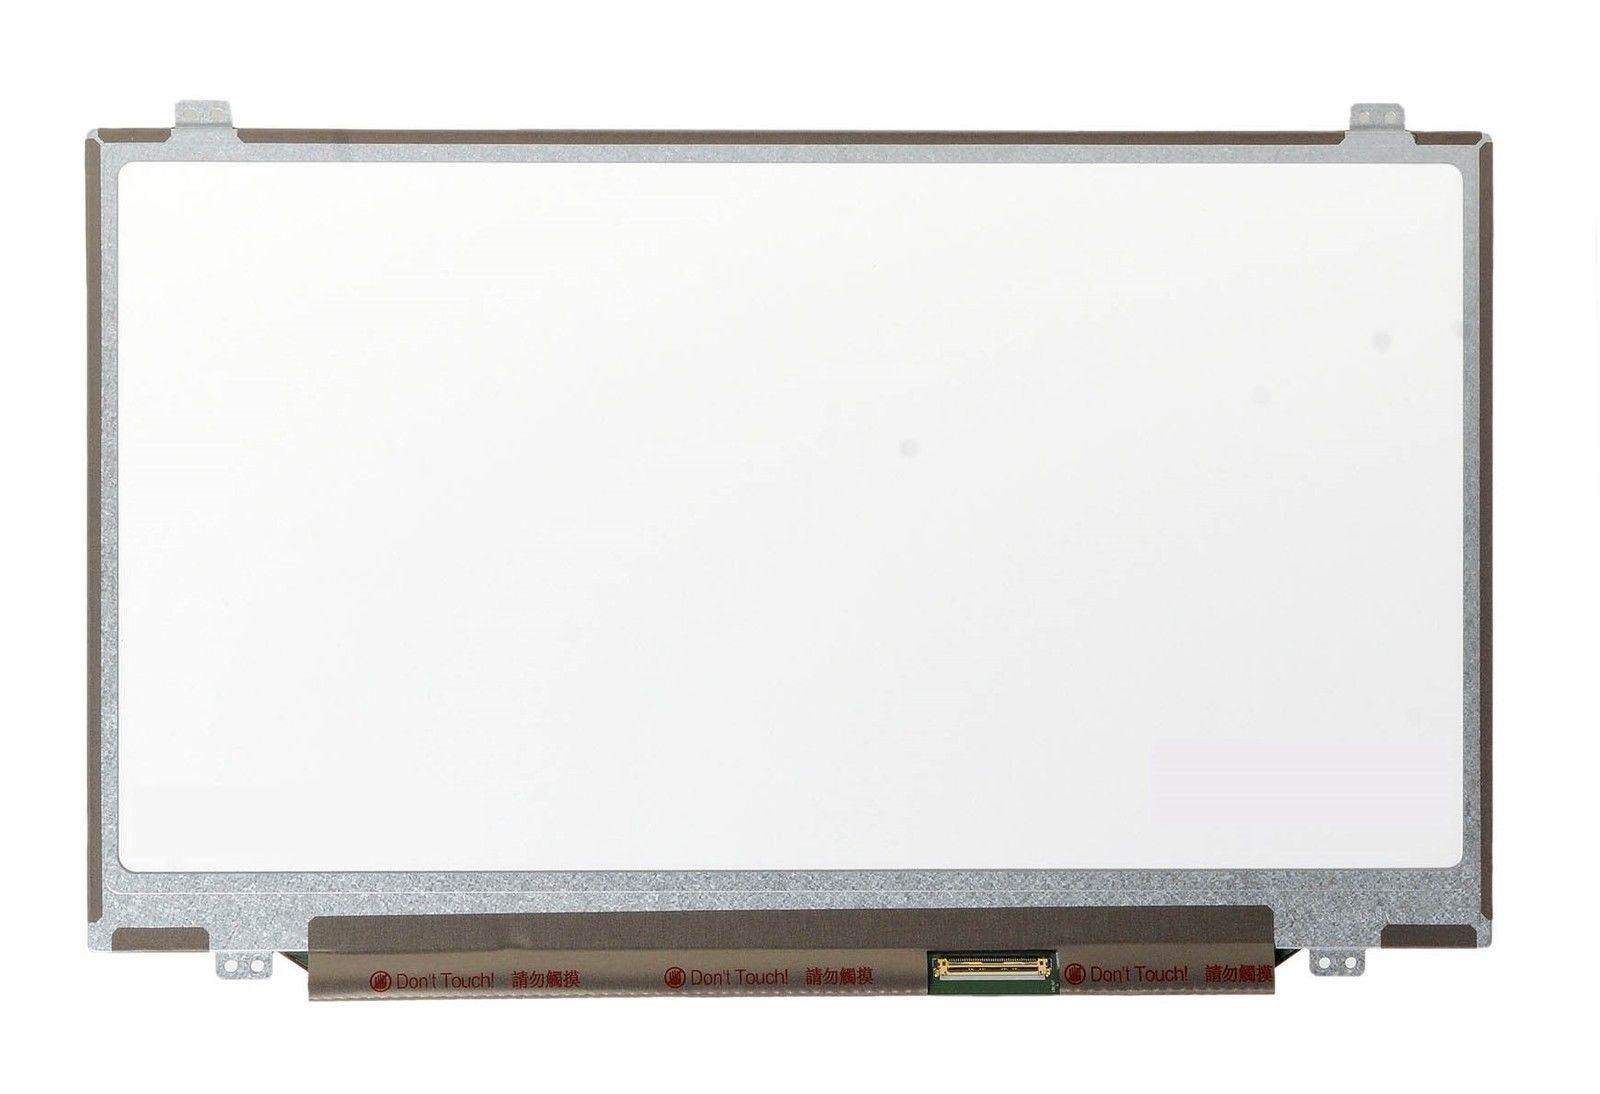 For Dell Inspiron 1470 New 14.0 WXGA HD Slim LED LCD Screen DisplayFor Dell Inspiron 1470 New 14.0 WXGA HD Slim LED LCD Screen Display